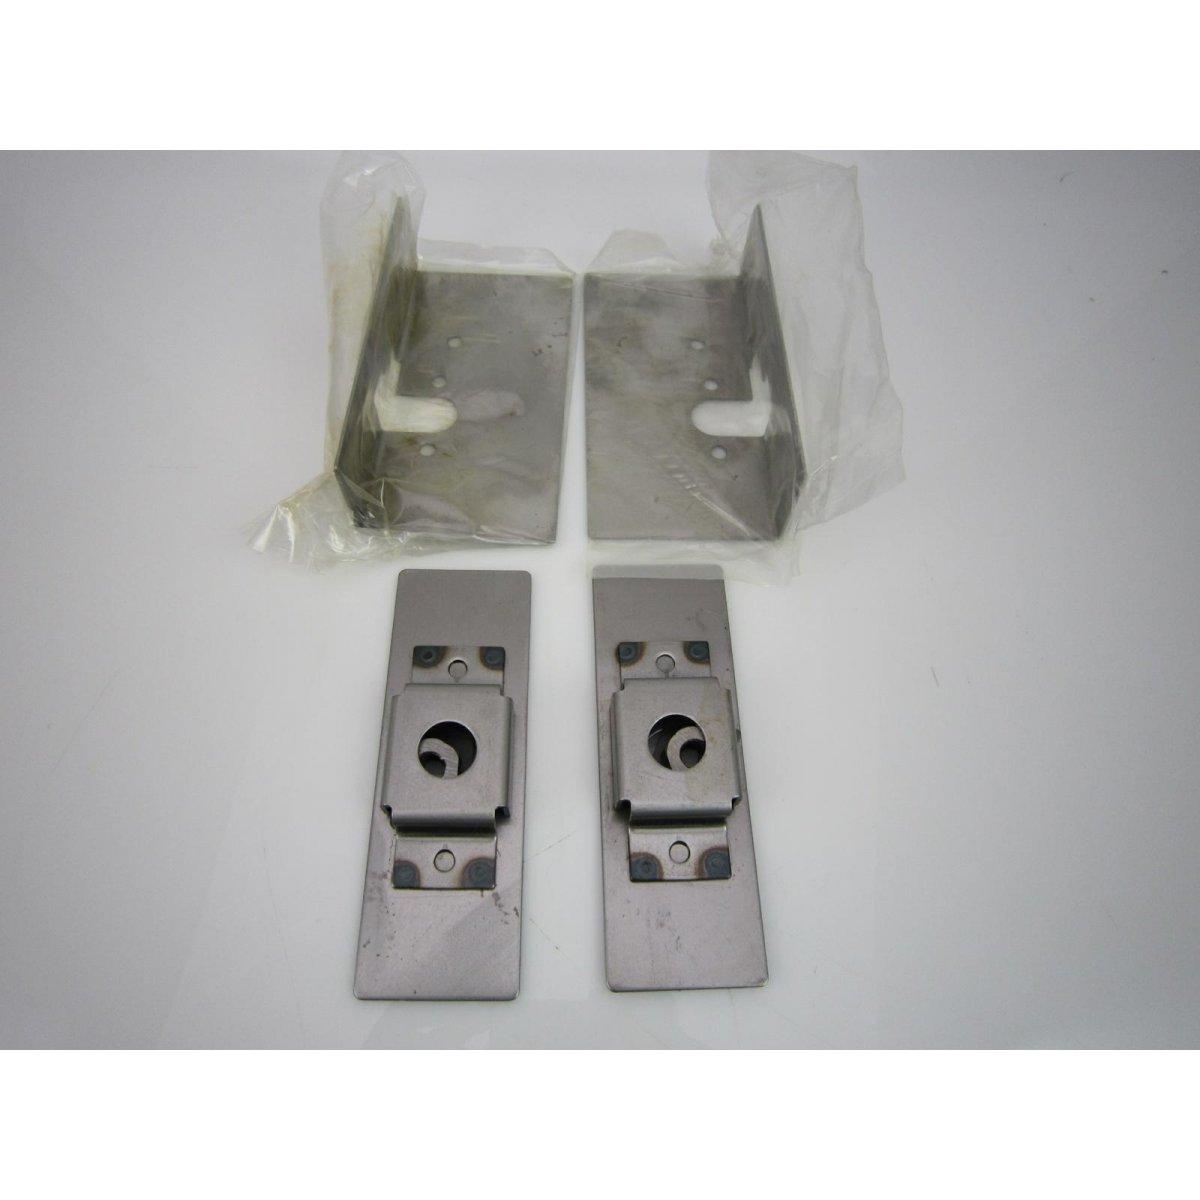 1962 saab 96 gt door jamb latch replacement kit exterior for Door jamb kit